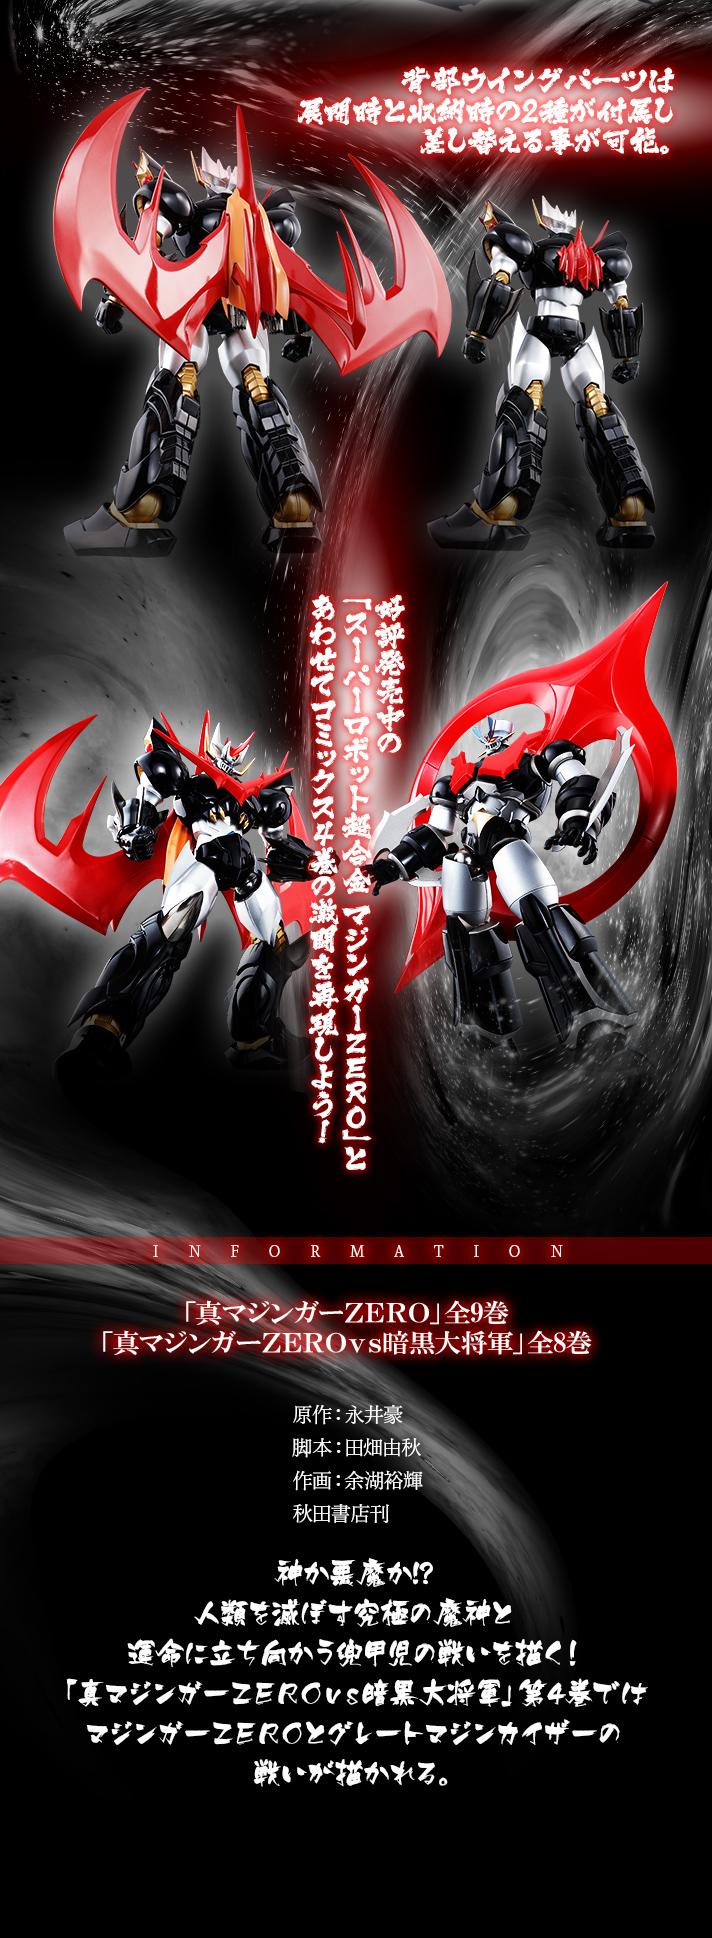 SR超合金 - 金剛大魔神凱薩 スーパーロボット超合金 グレートマジンカイザー